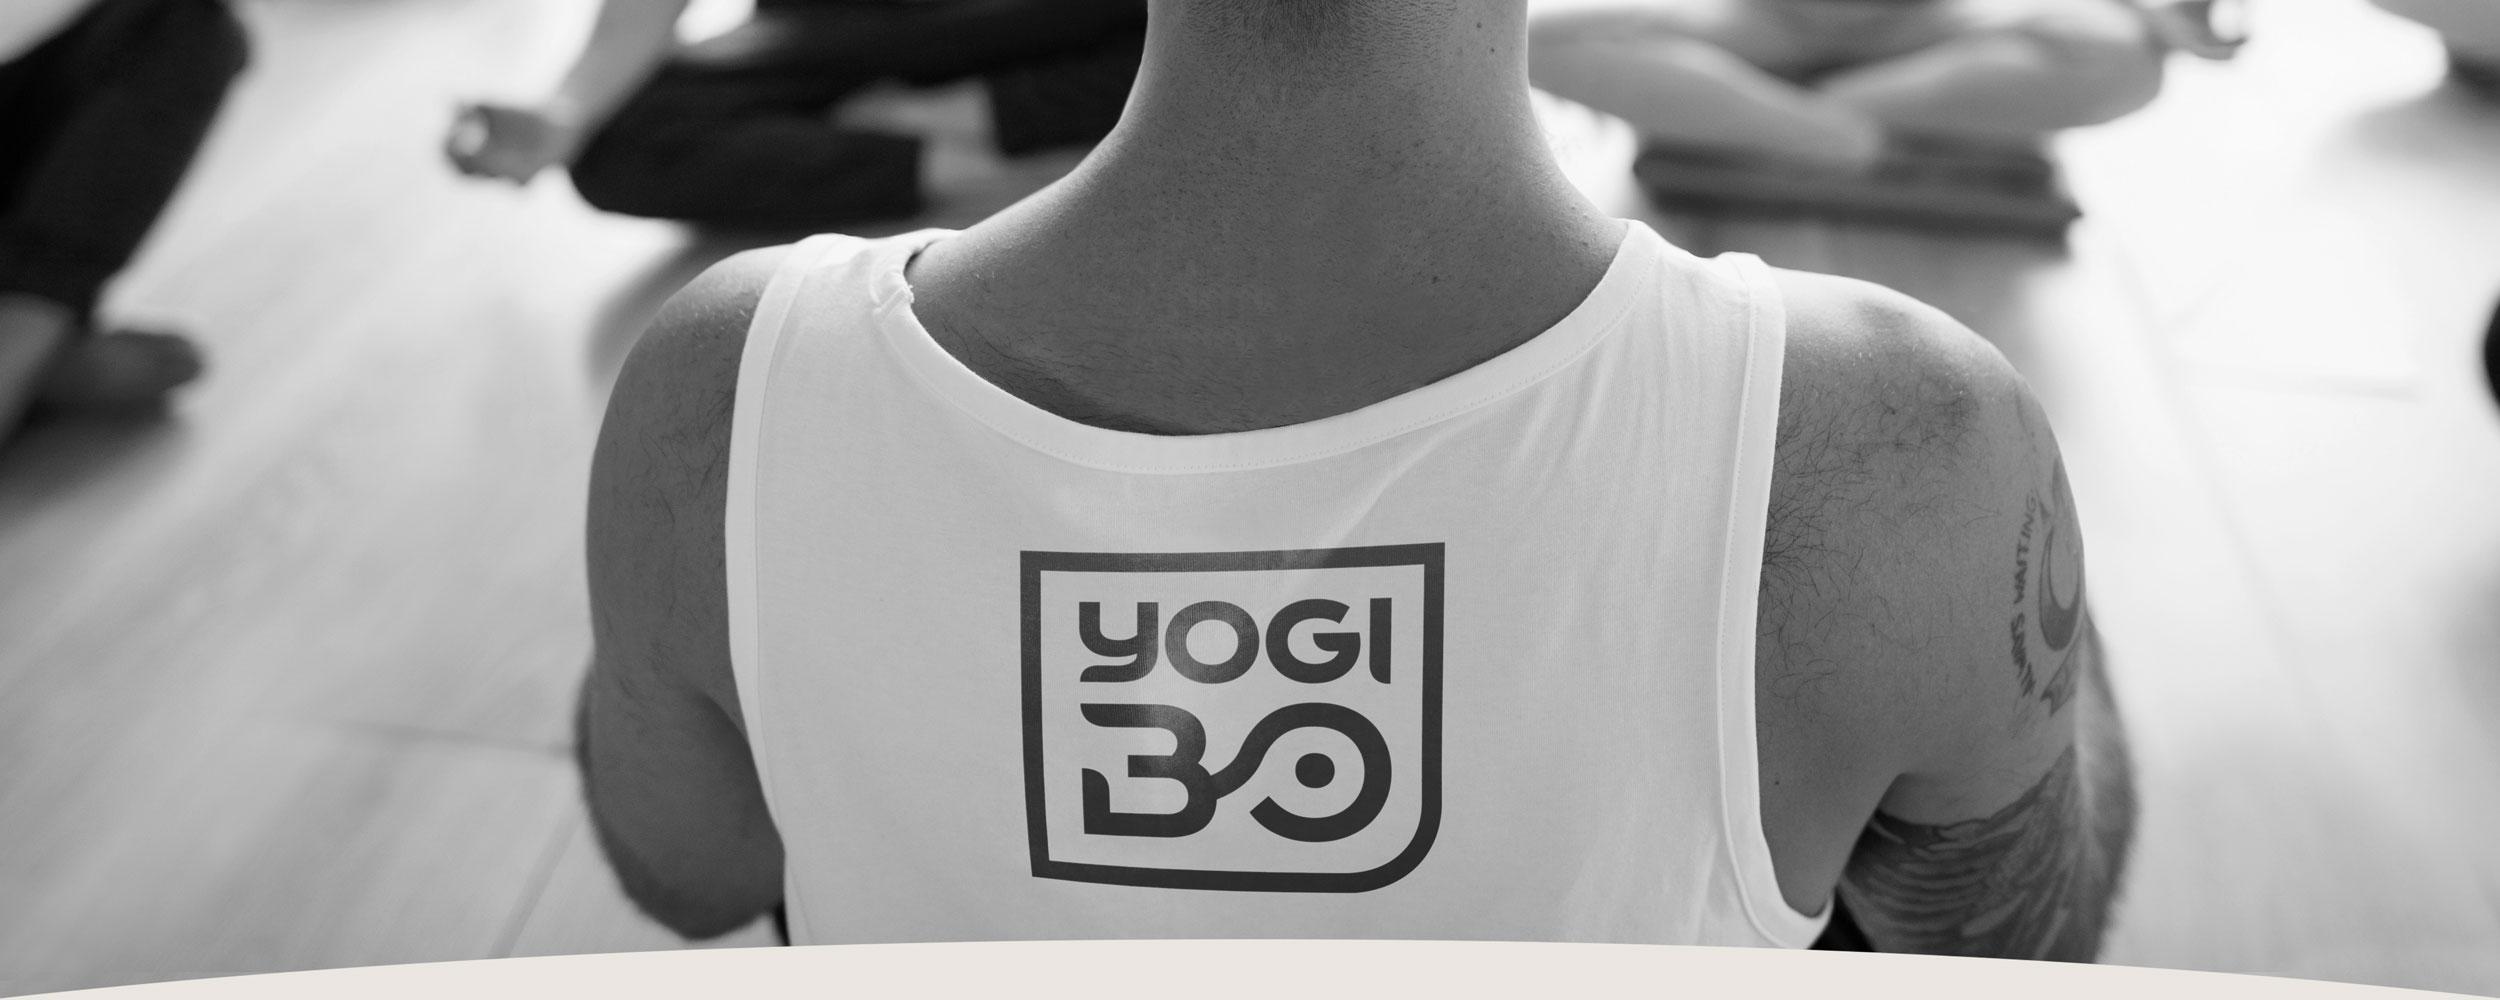 Yogi Bo Logo gedruckt auf Shirt von Yogalehrer